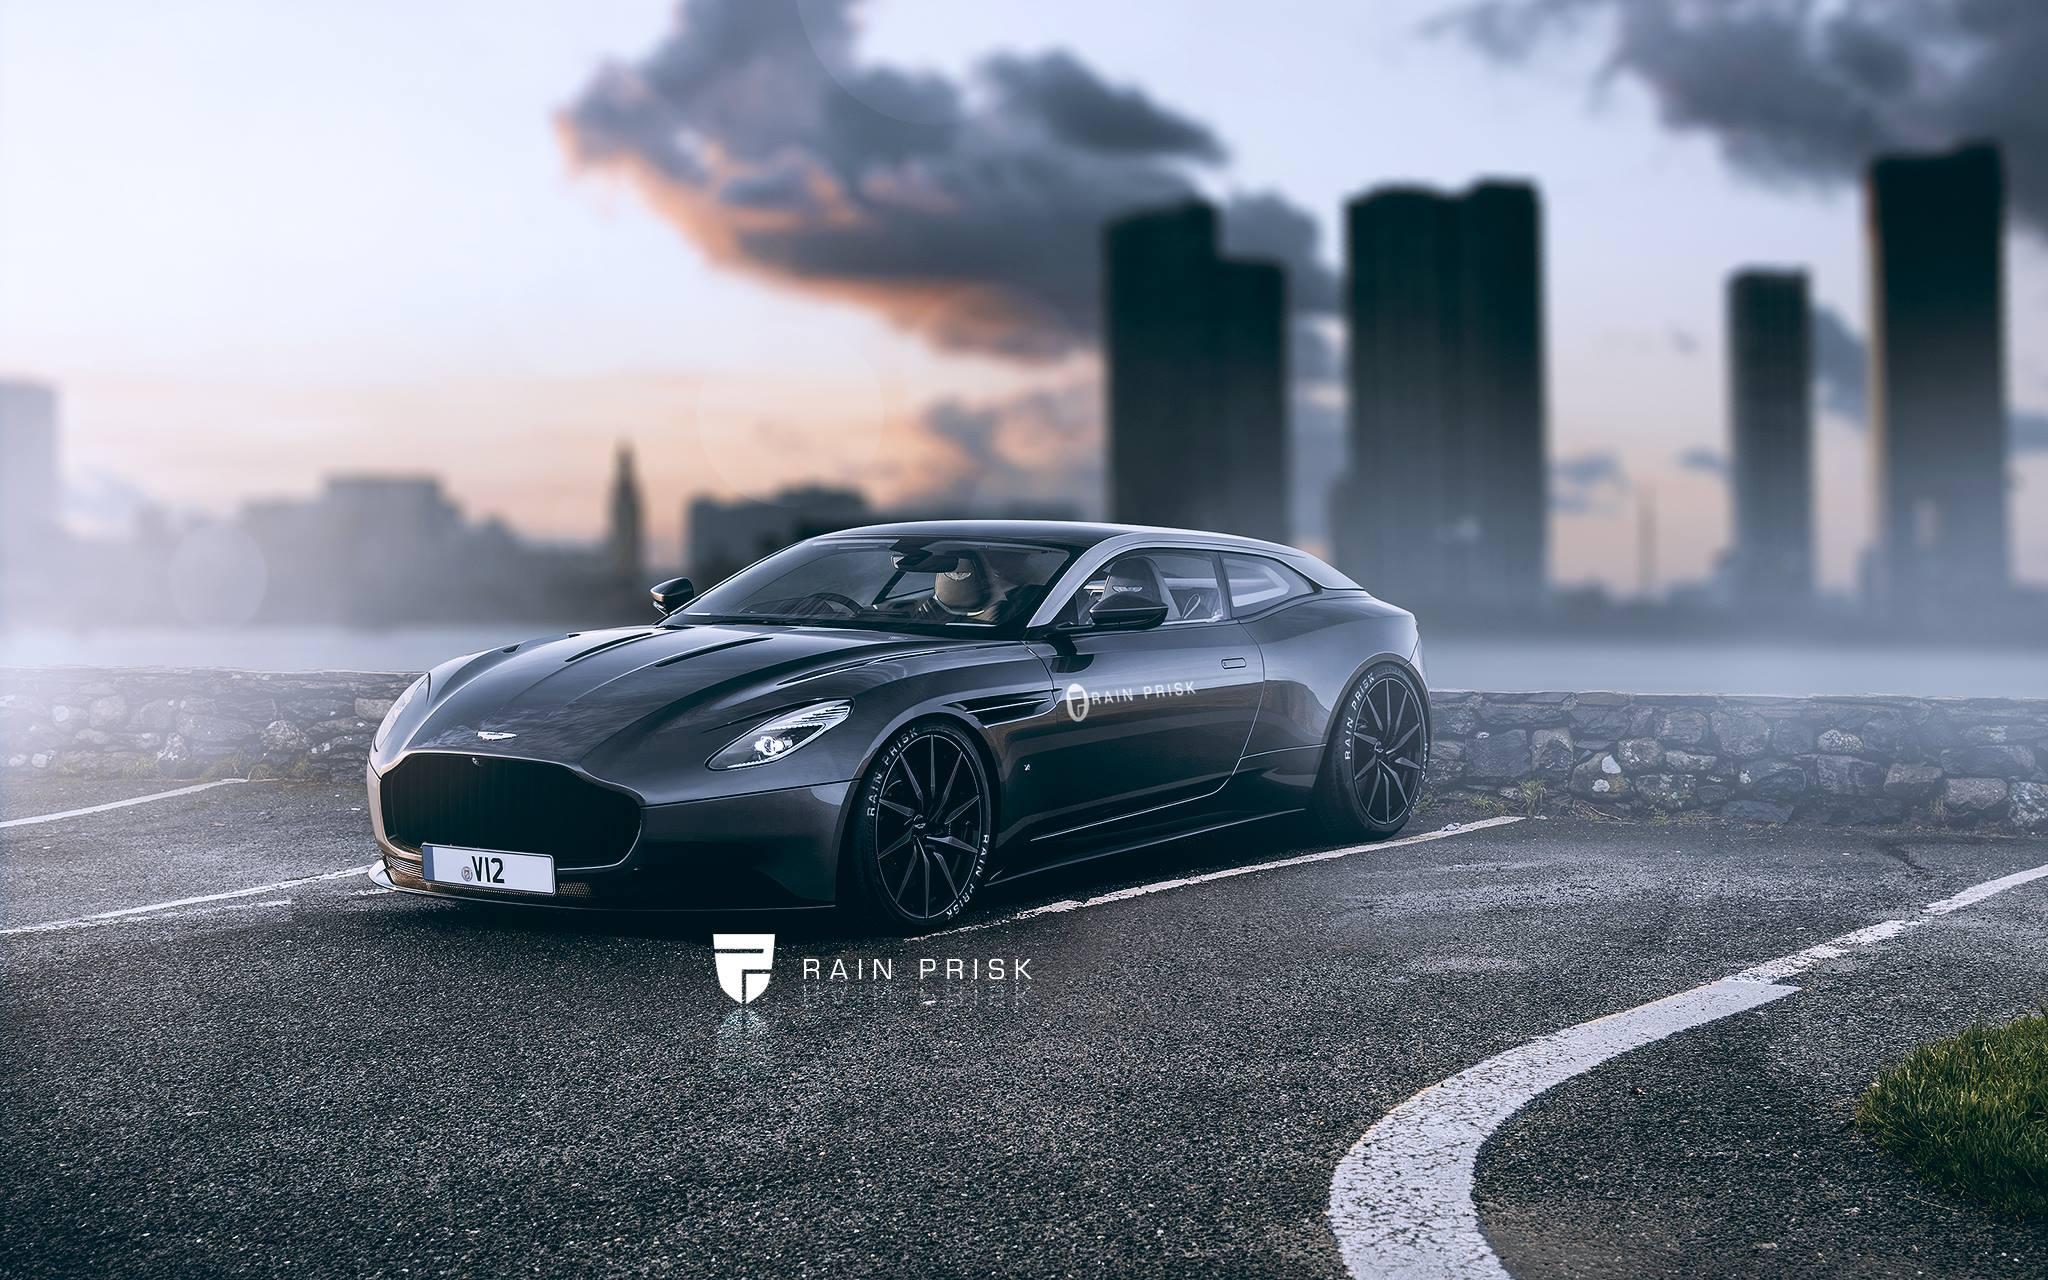 Ken Block Cars Wallpaper Aston Martin Shooting Brake Rendered The Ferrari